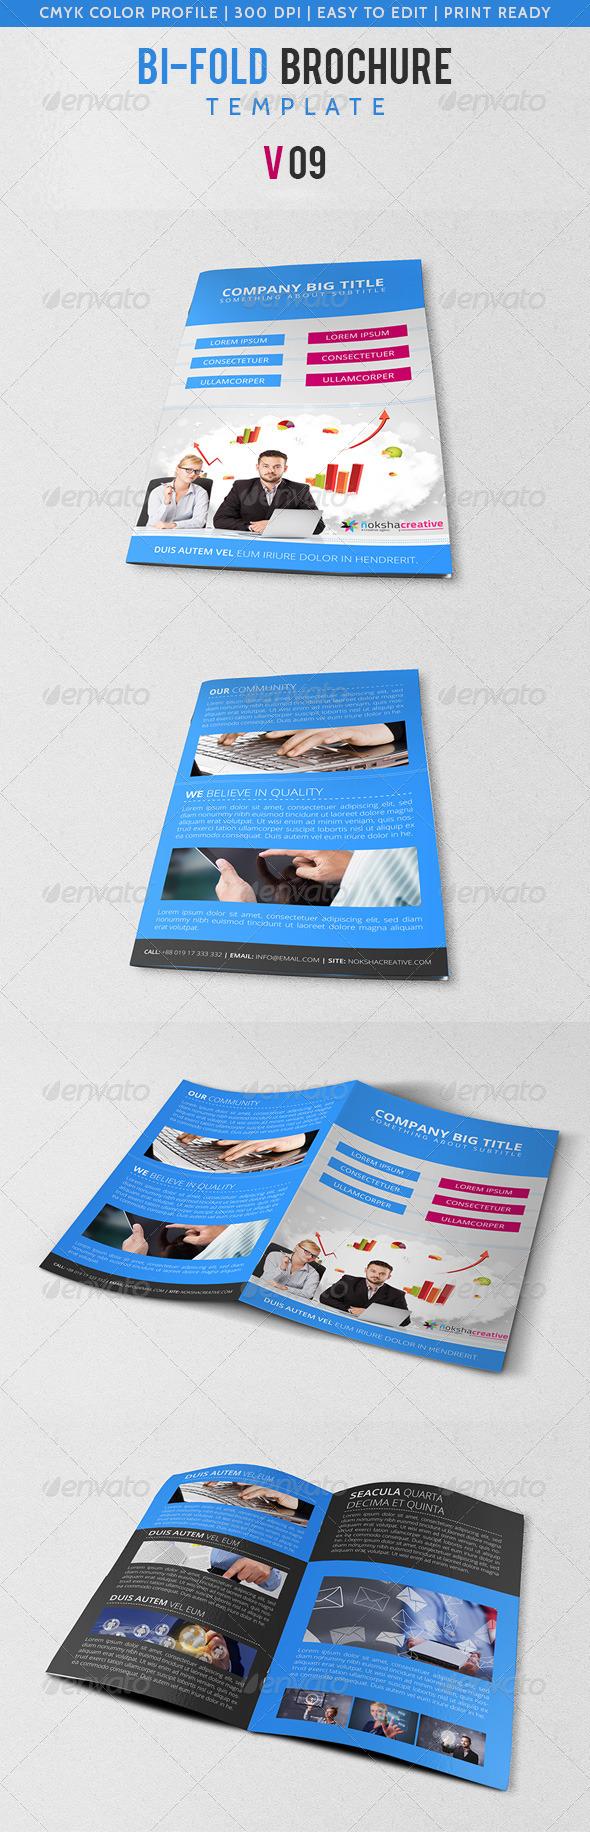 GraphicRiver Corporate Bi-Fold Brochure V-09 5621486